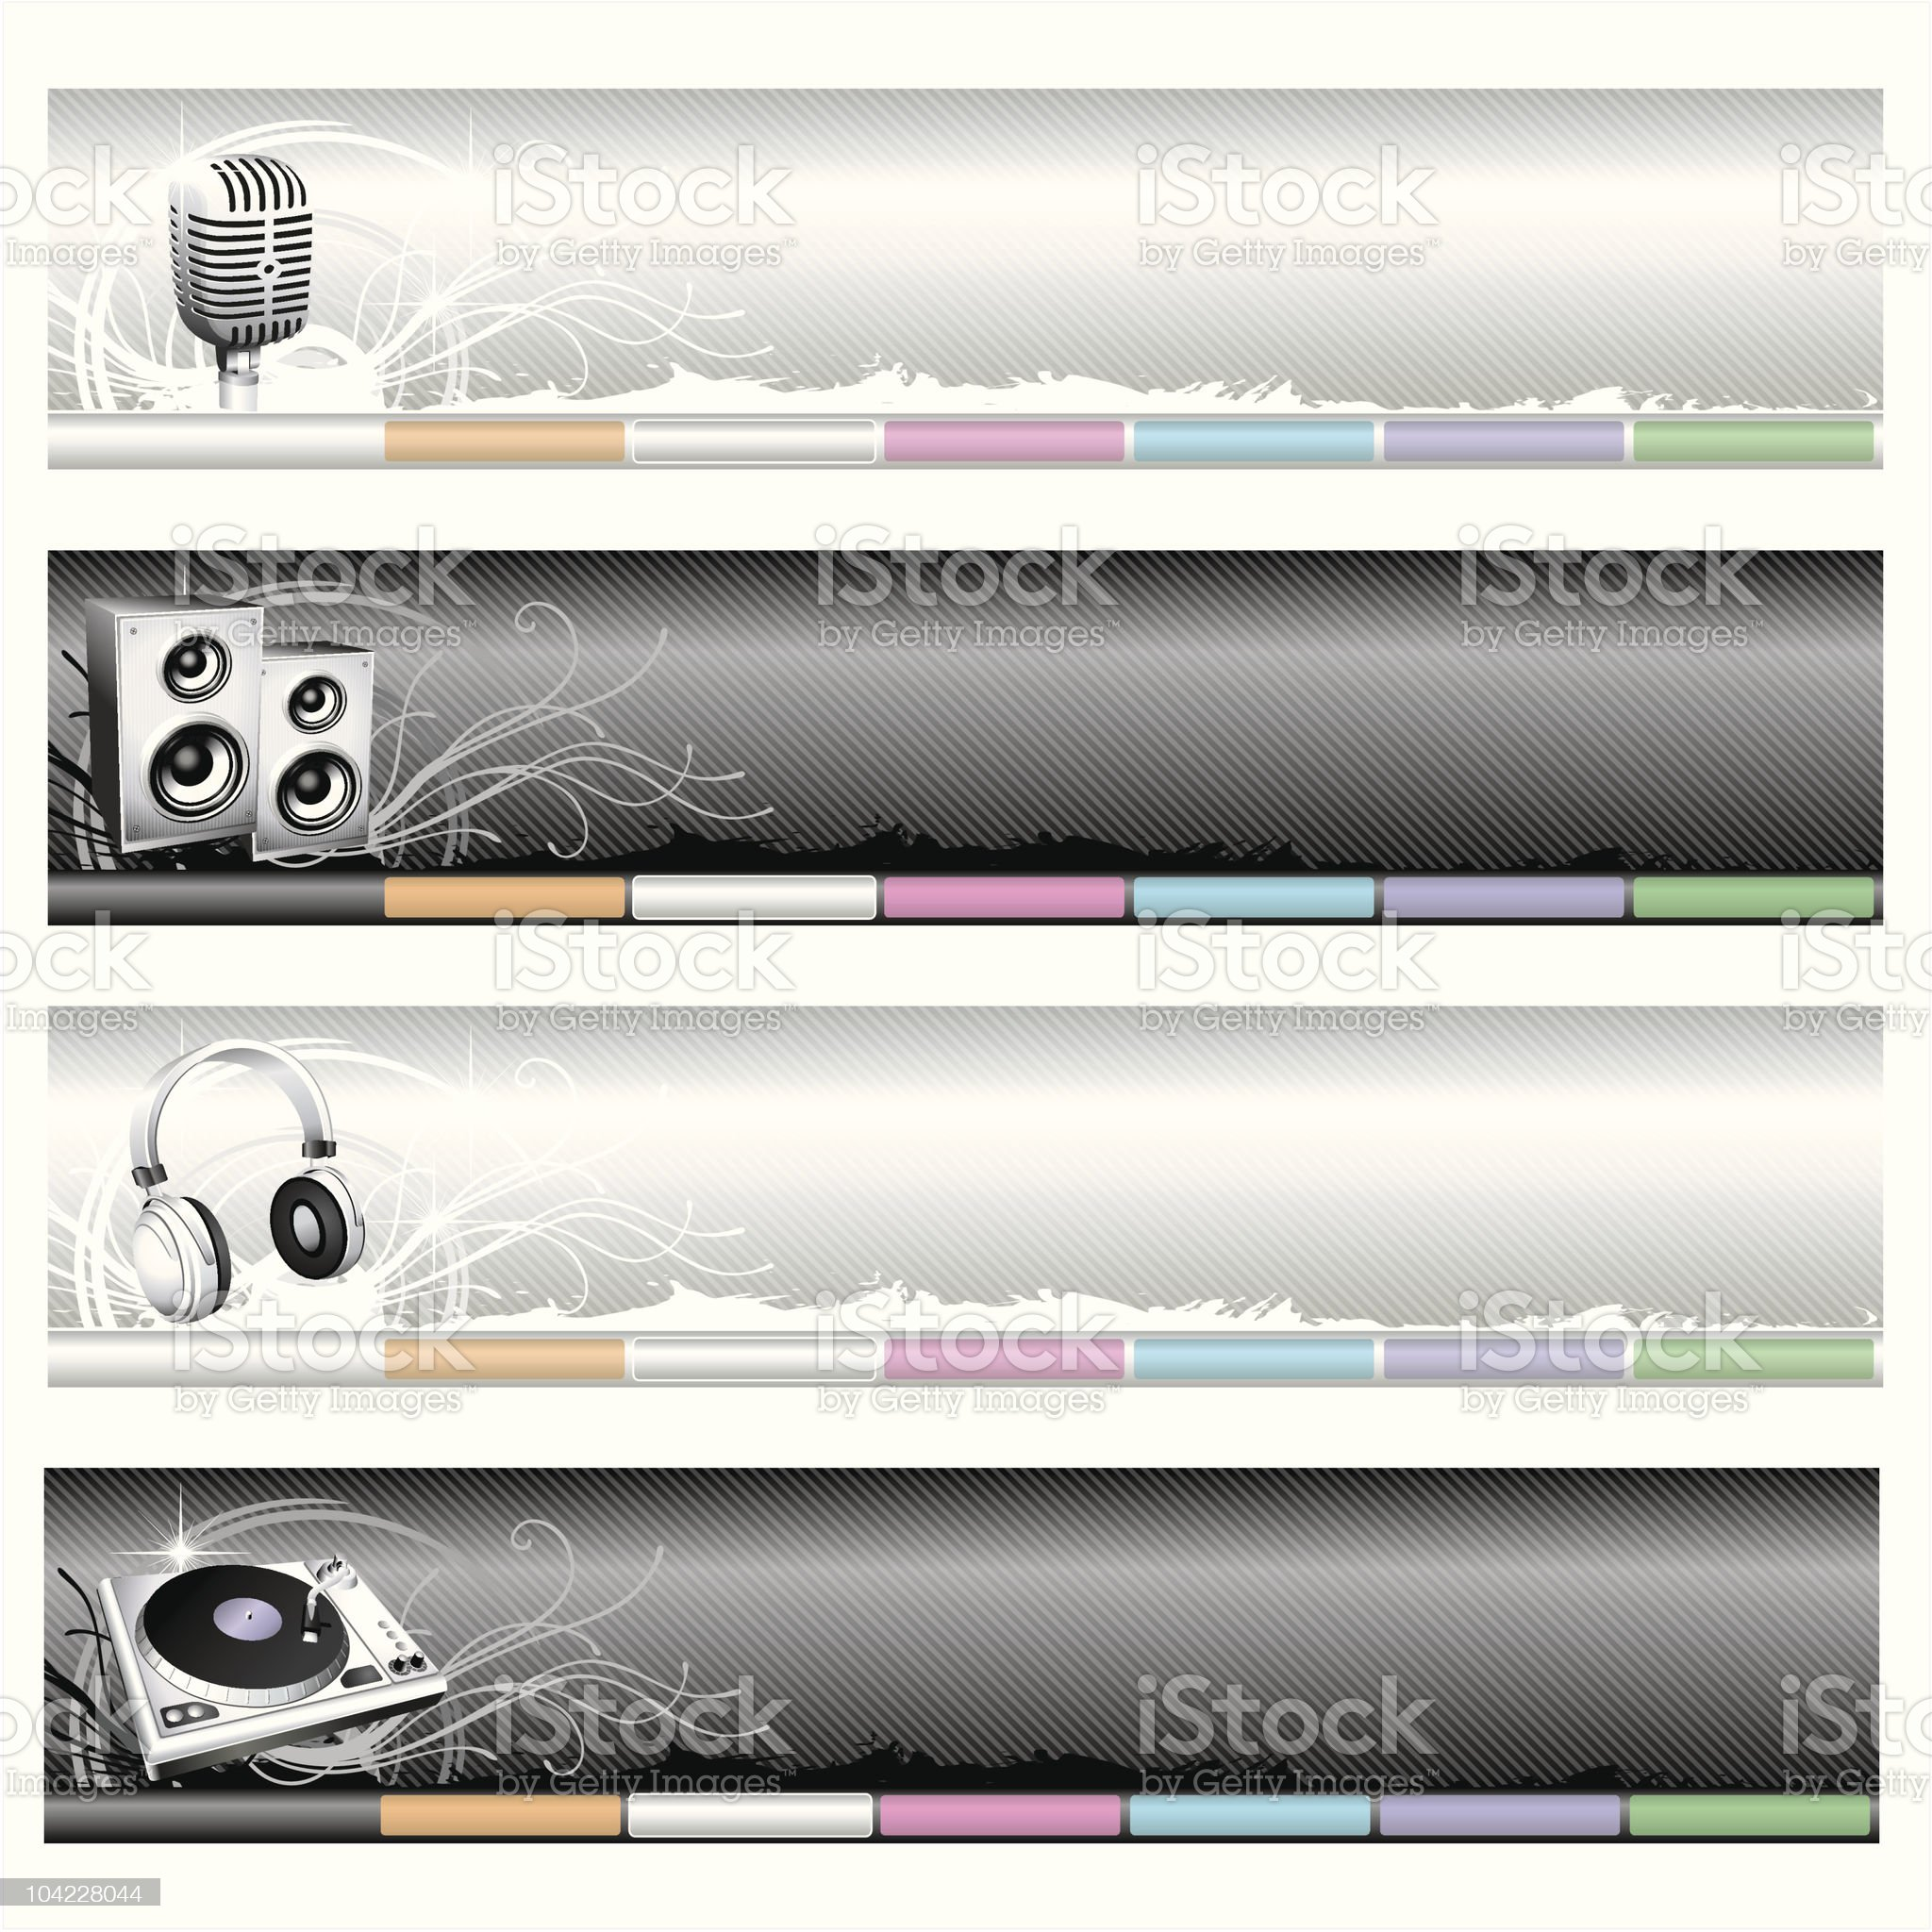 Music web-headers royalty-free stock vector art